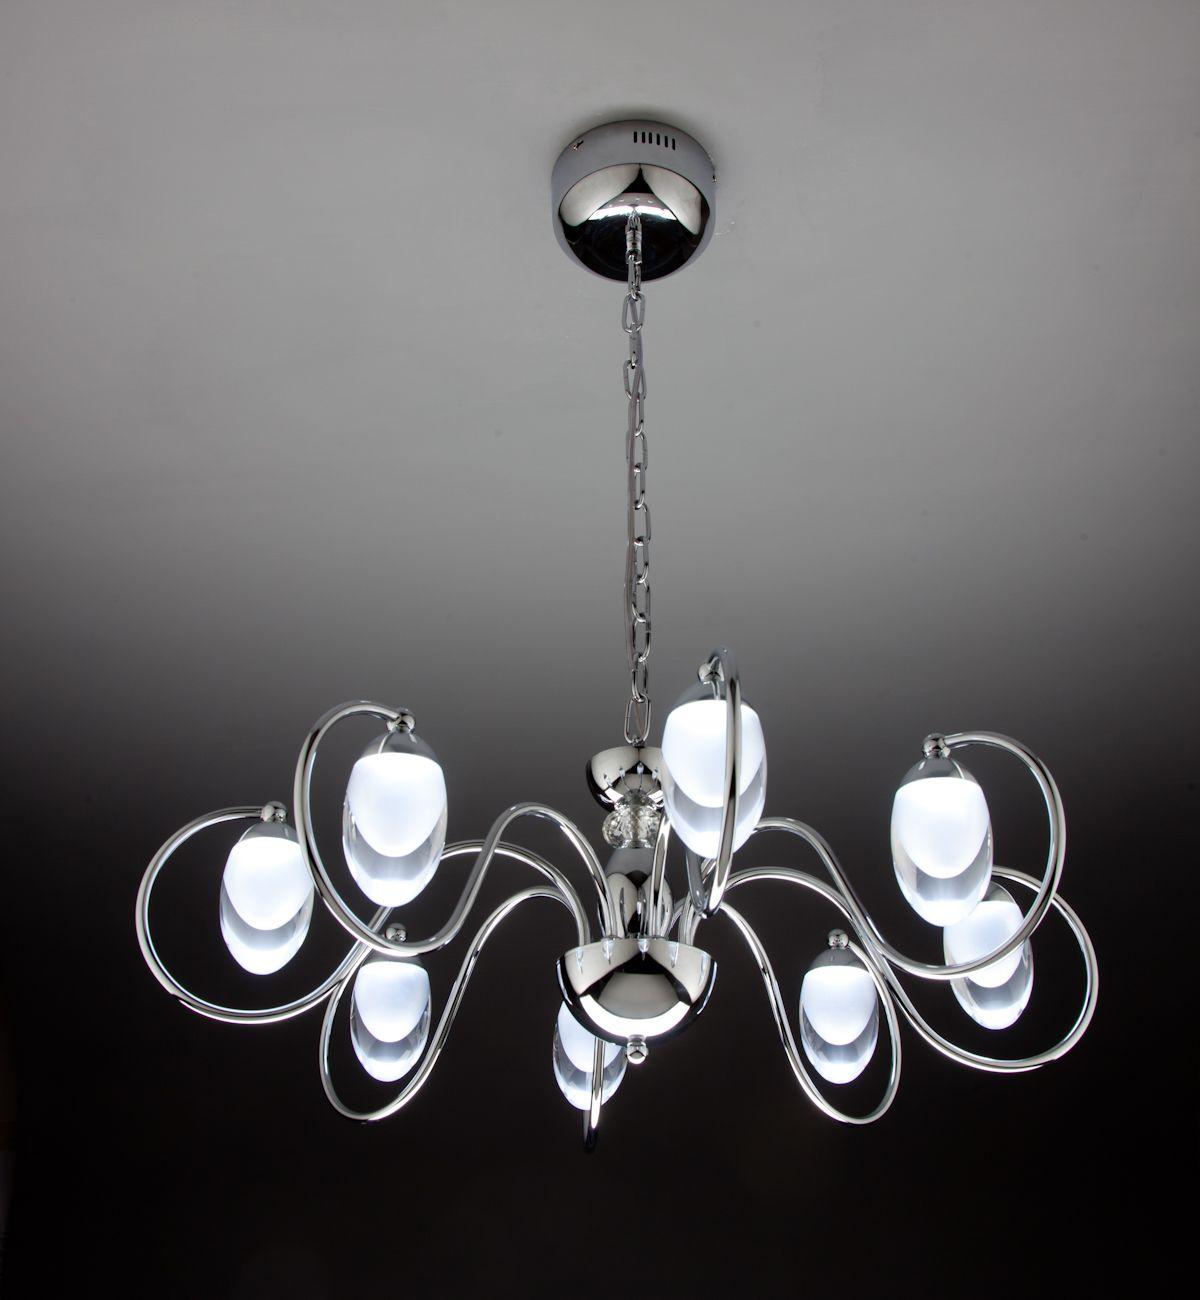 Lampadari Design Moderni.Lampadario A Sospensione Led Candeliere 8 Di Design Moderno